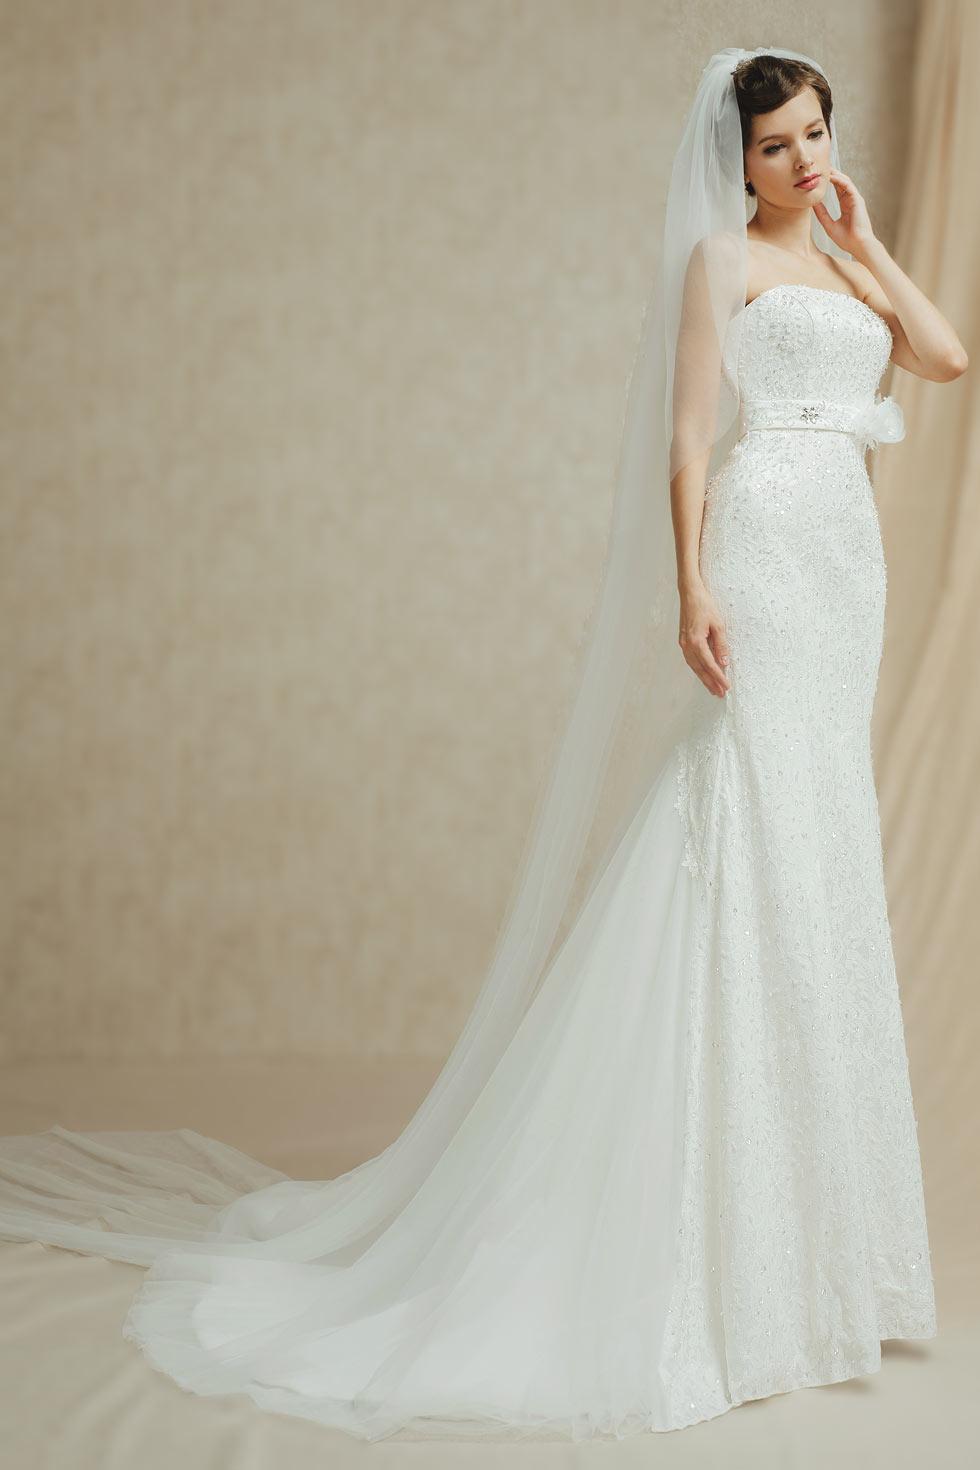 Chic white ivory Mermaid Lace Strapless Chapel Train Wedding Dress With Sash